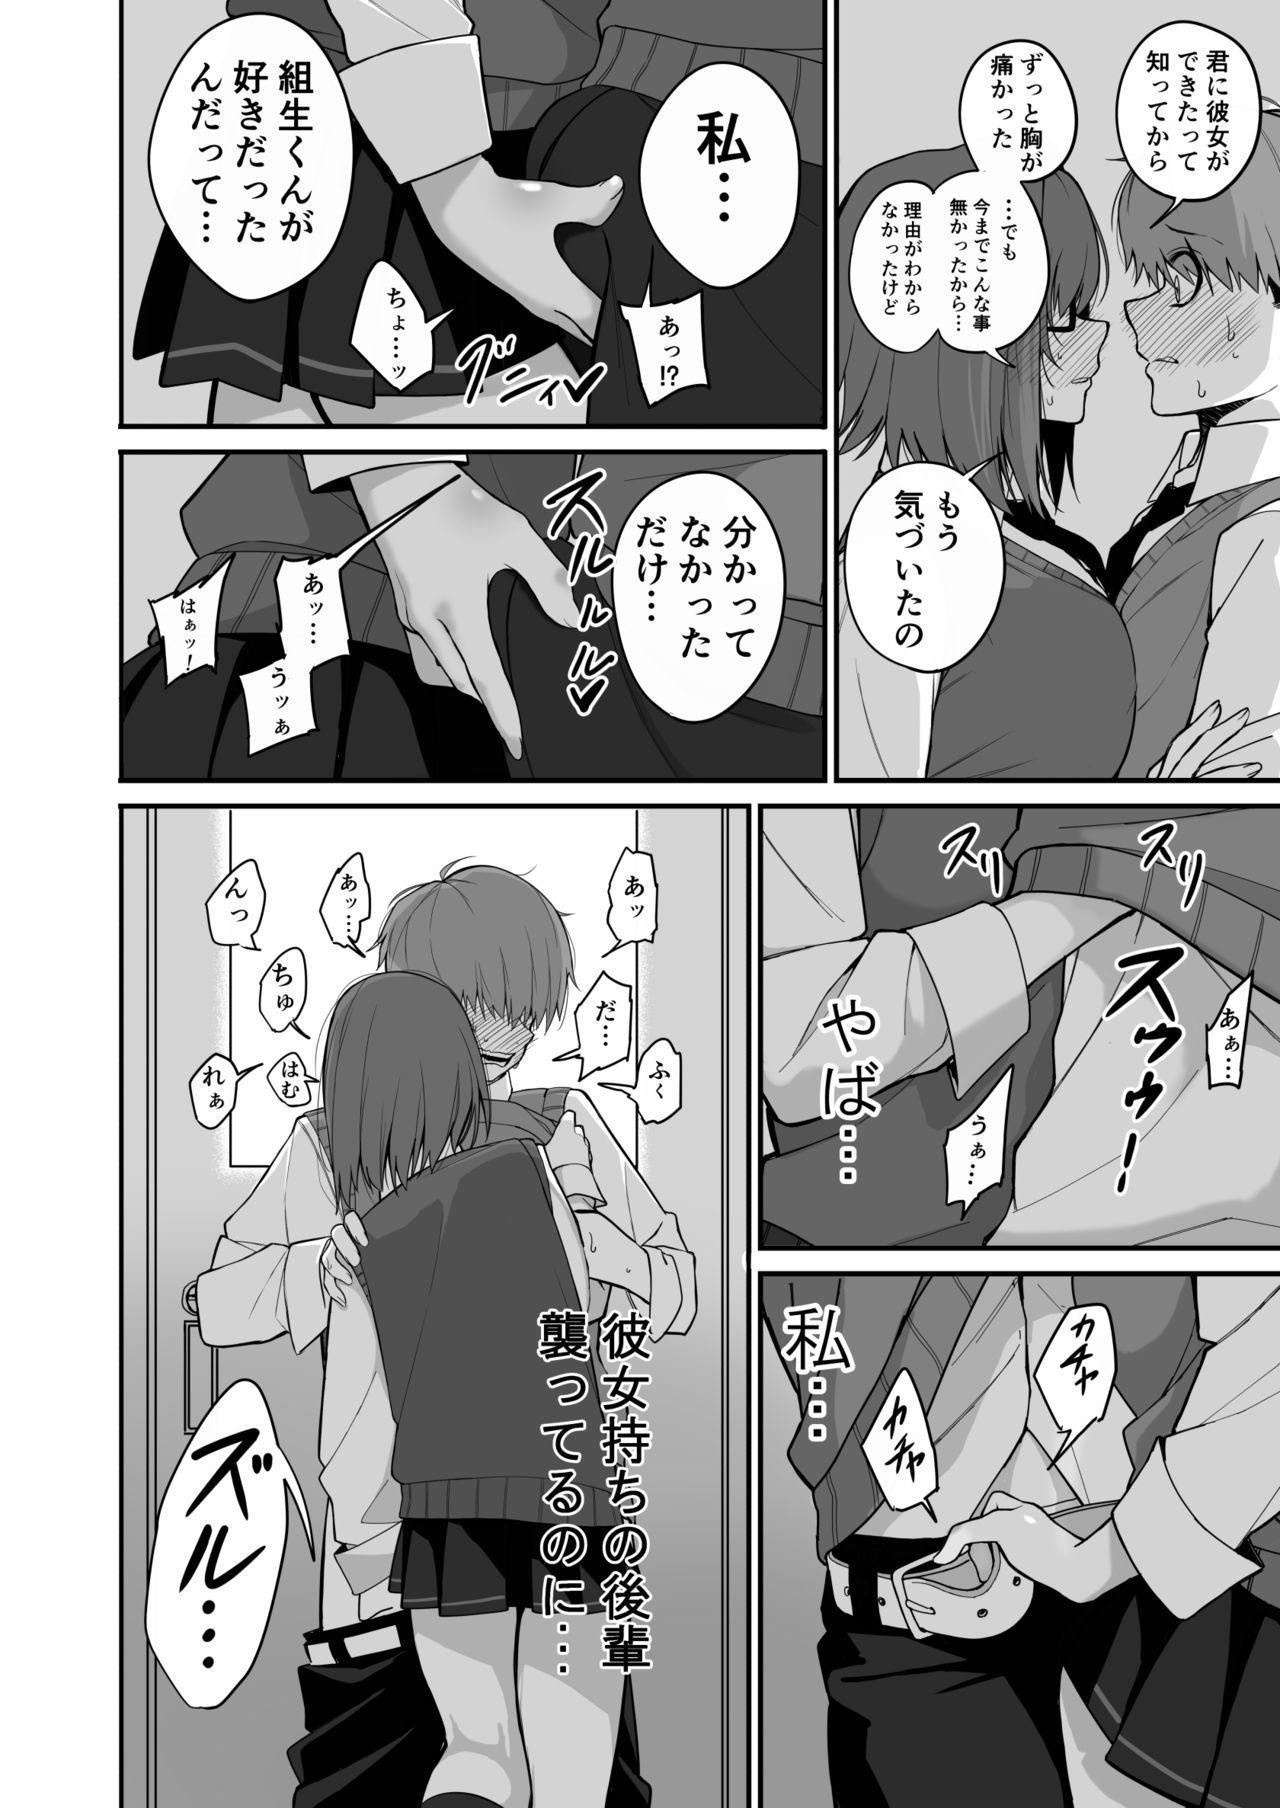 Itabasami na Wakachi Ai 2 15